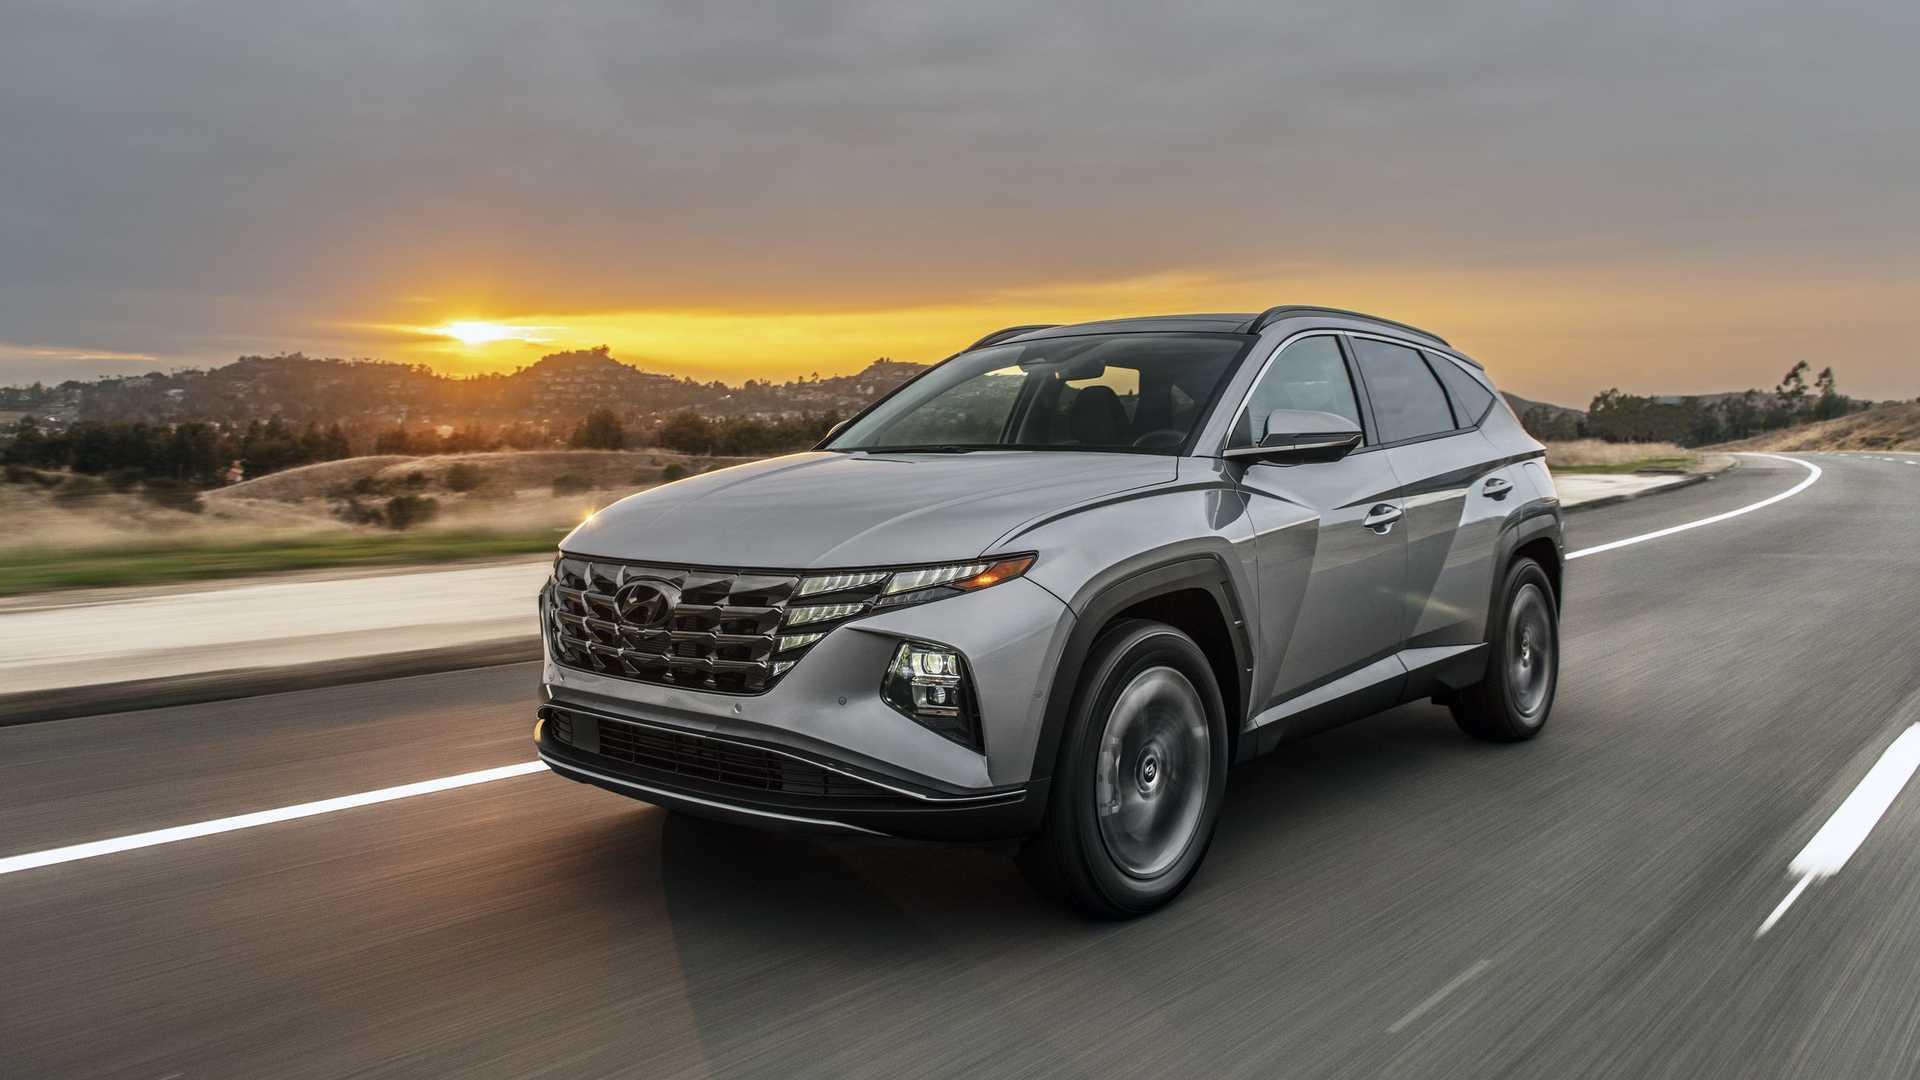 2022 Hyundai Tucson PHEV Cheaper Than Toyota RAV4 Prime